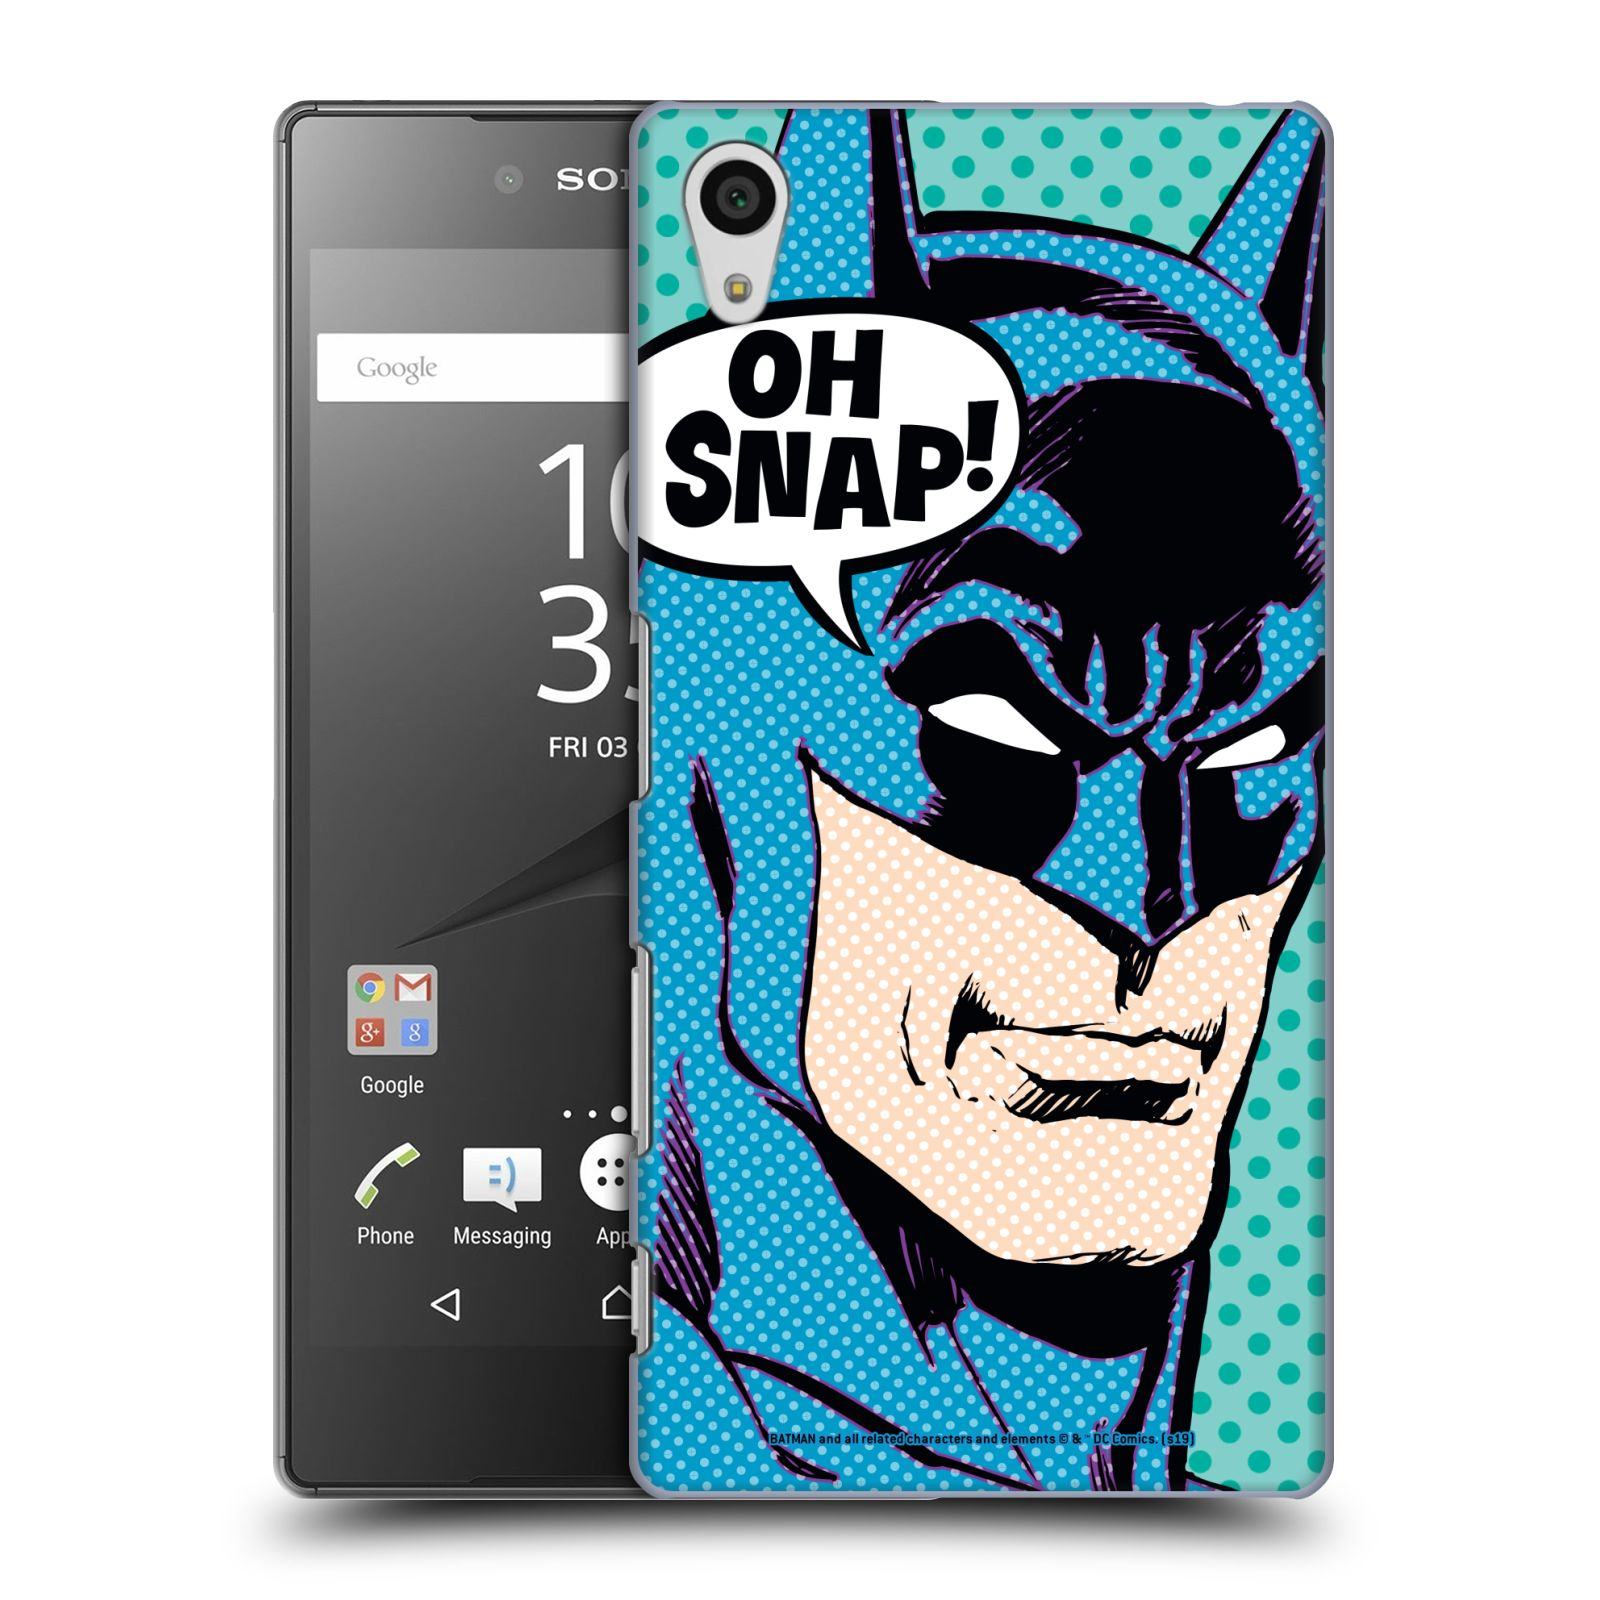 Pouzdro na mobil Sony Xperia Z5 - HEAD CASE - DC komix Batman Pop Art tvář